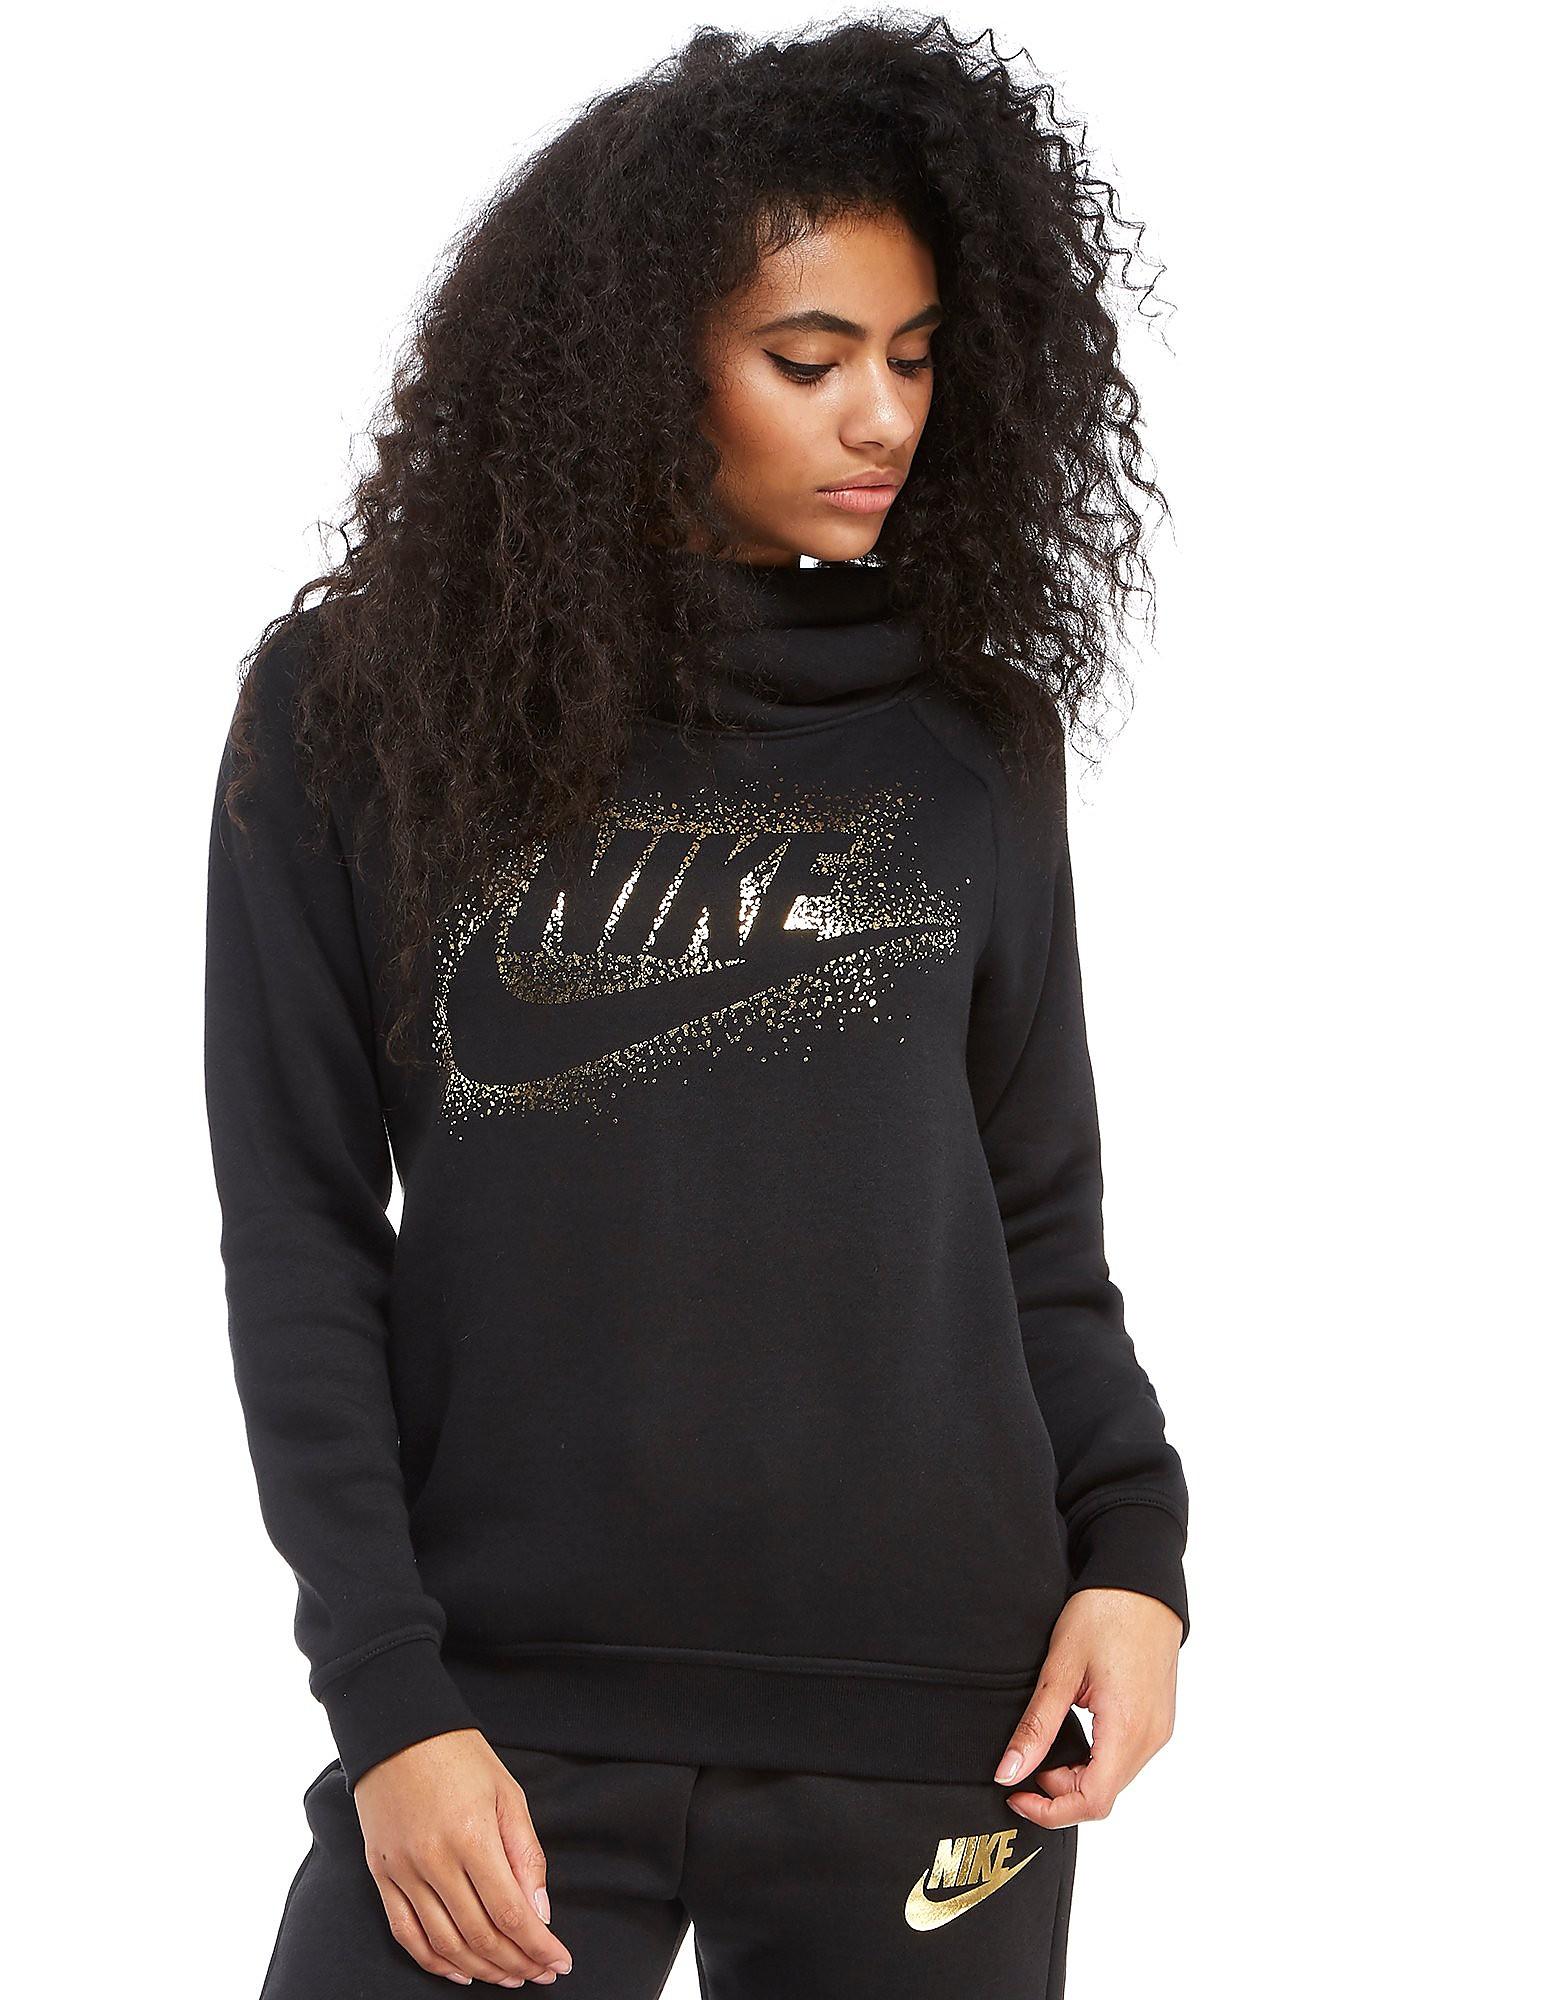 Nike Metallic Overhead Hoodie